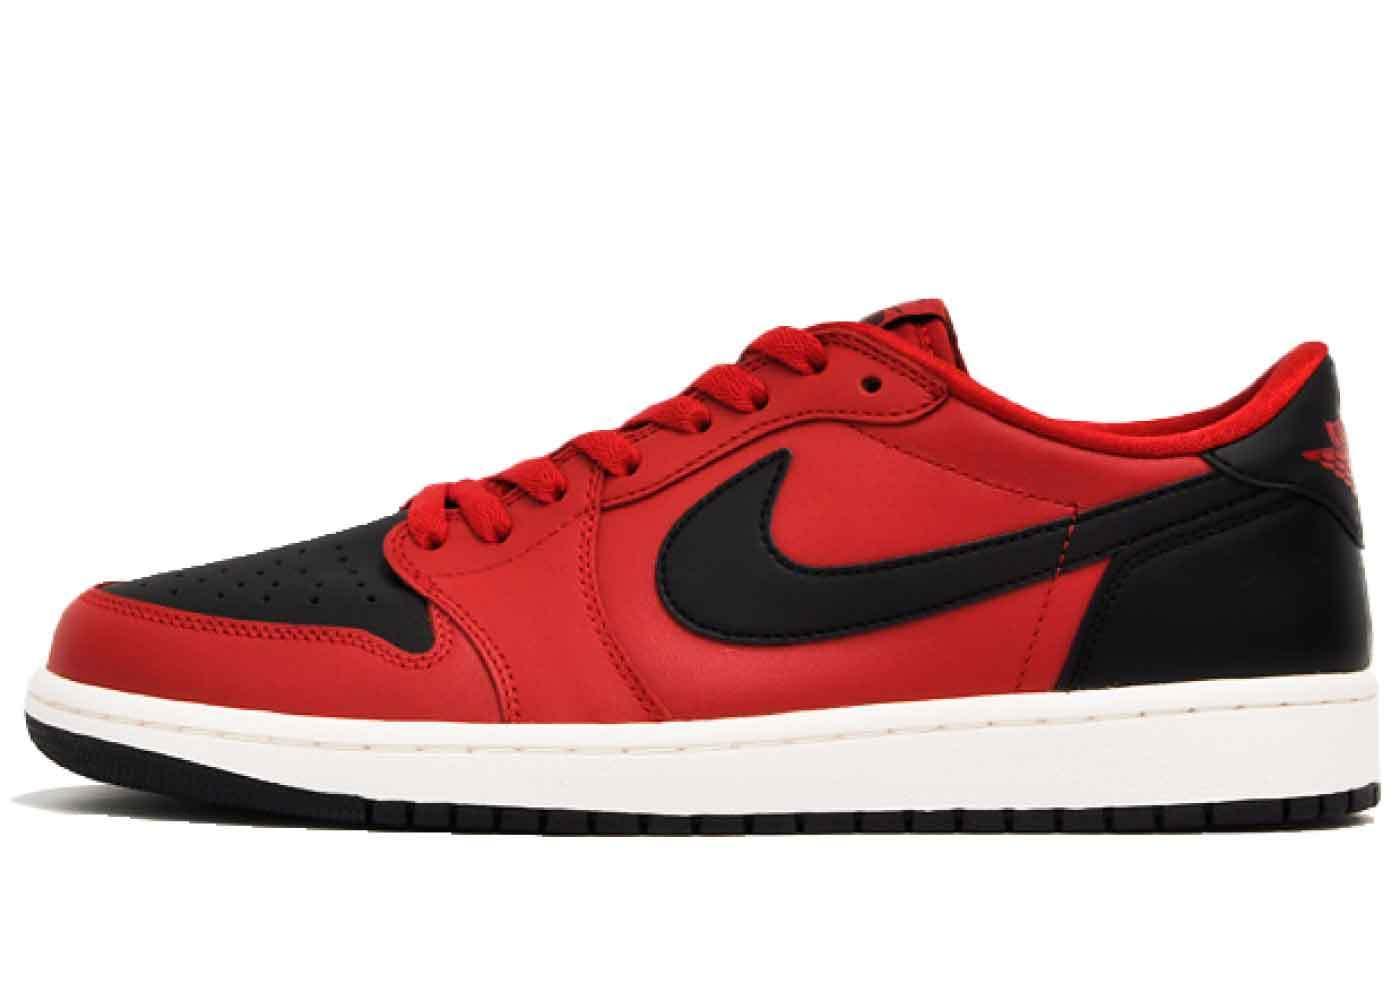 Nike Air Jordan 1 Retro Low Gym Red Blackの写真